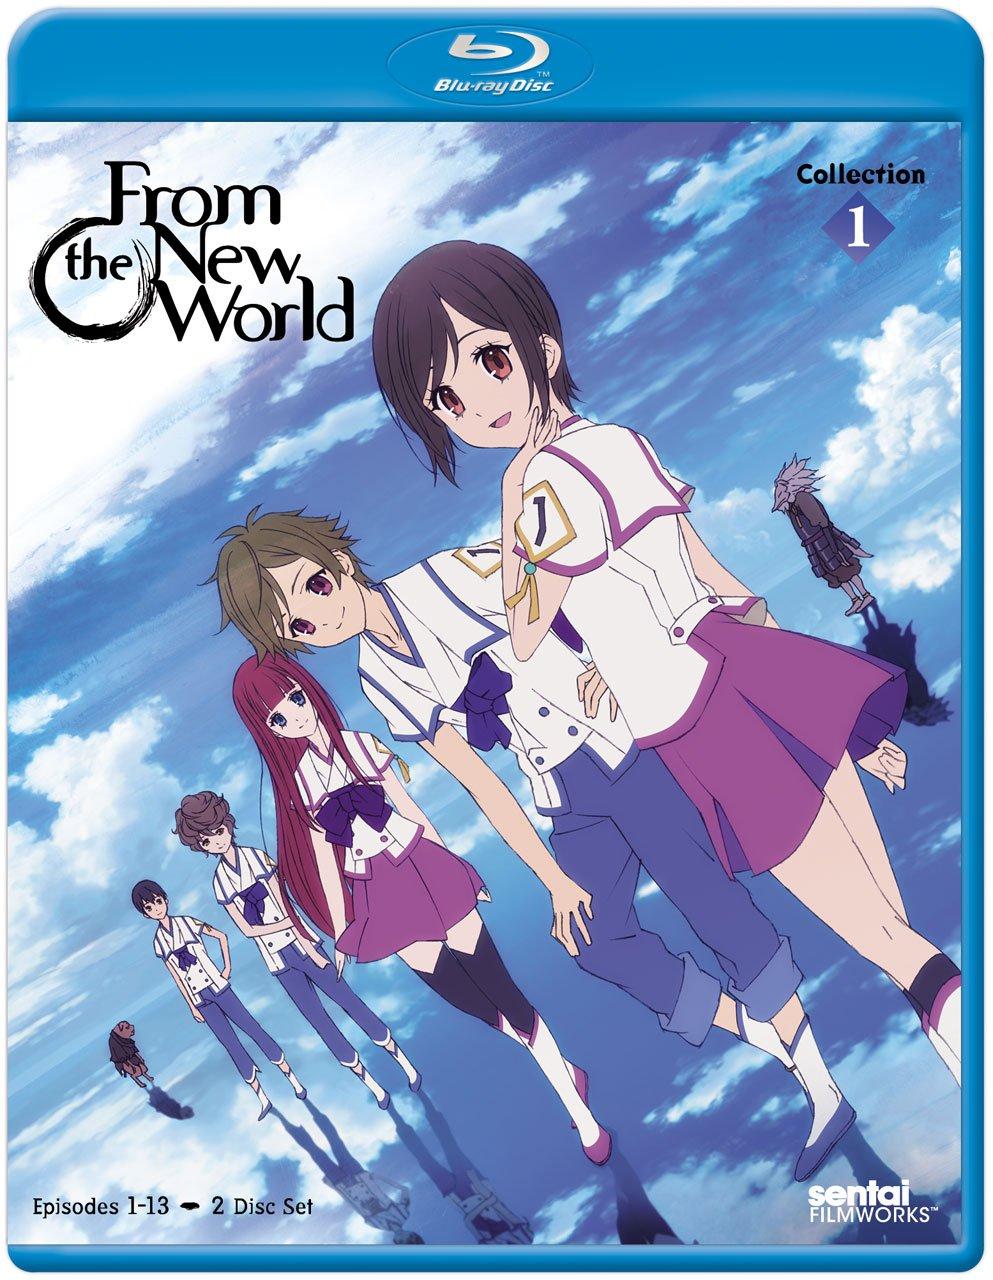 Amazon com from the new world collection 1 blu ray masashi ishihama john ledford movies tv